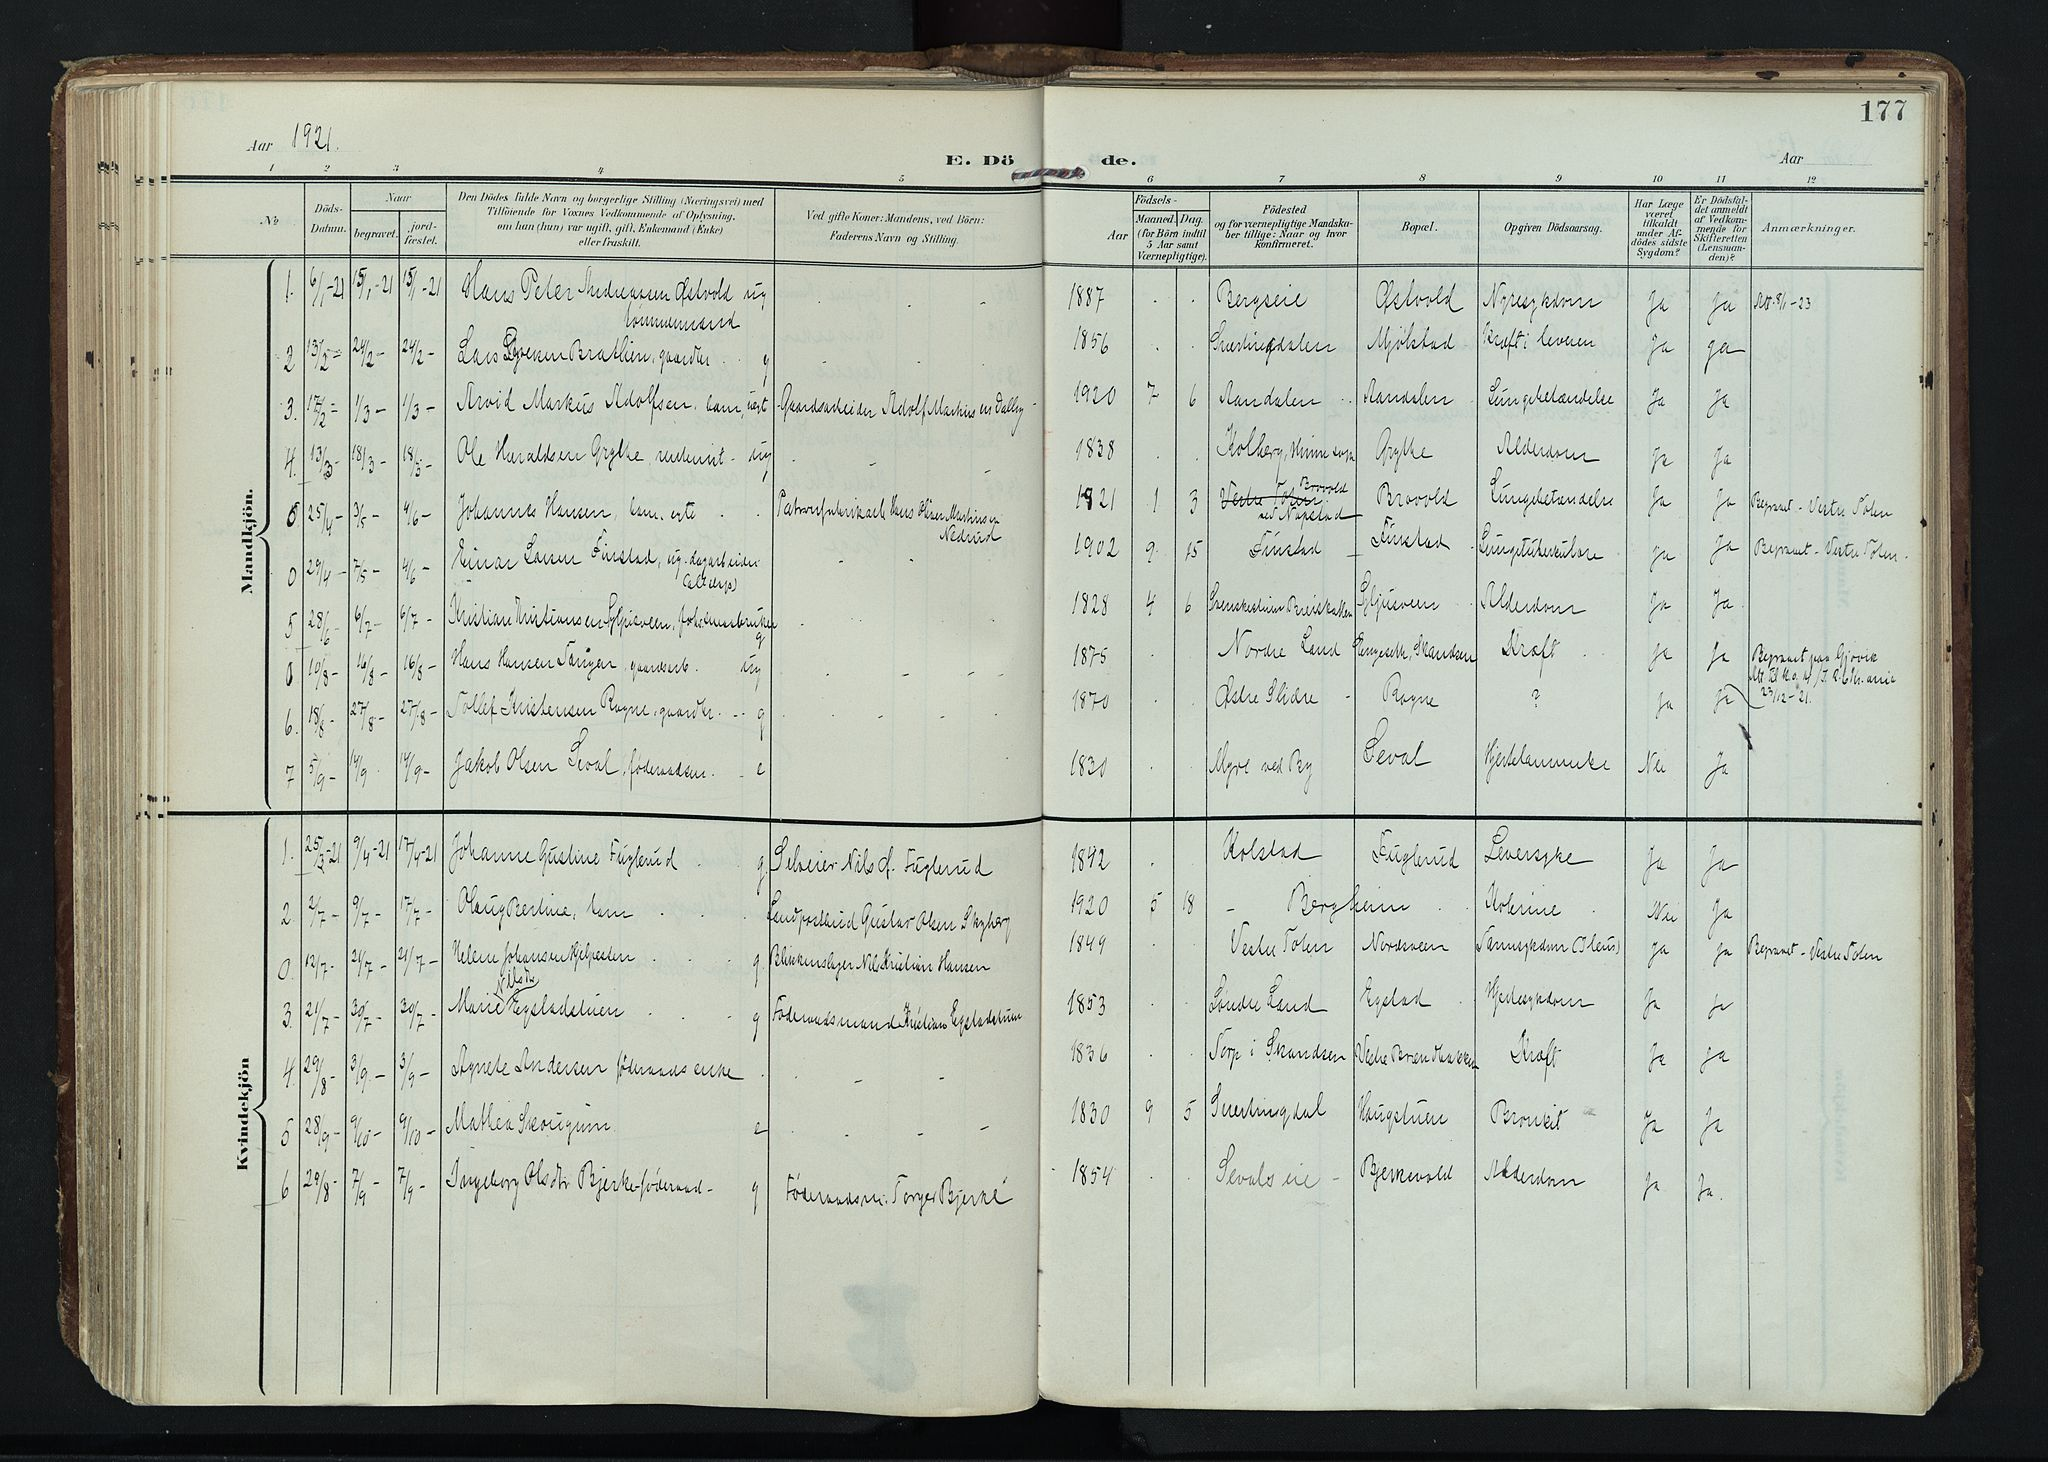 SAH, Vardal prestekontor, H/Ha/Haa/L0020: Ministerialbok nr. 20, 1907-1921, s. 177